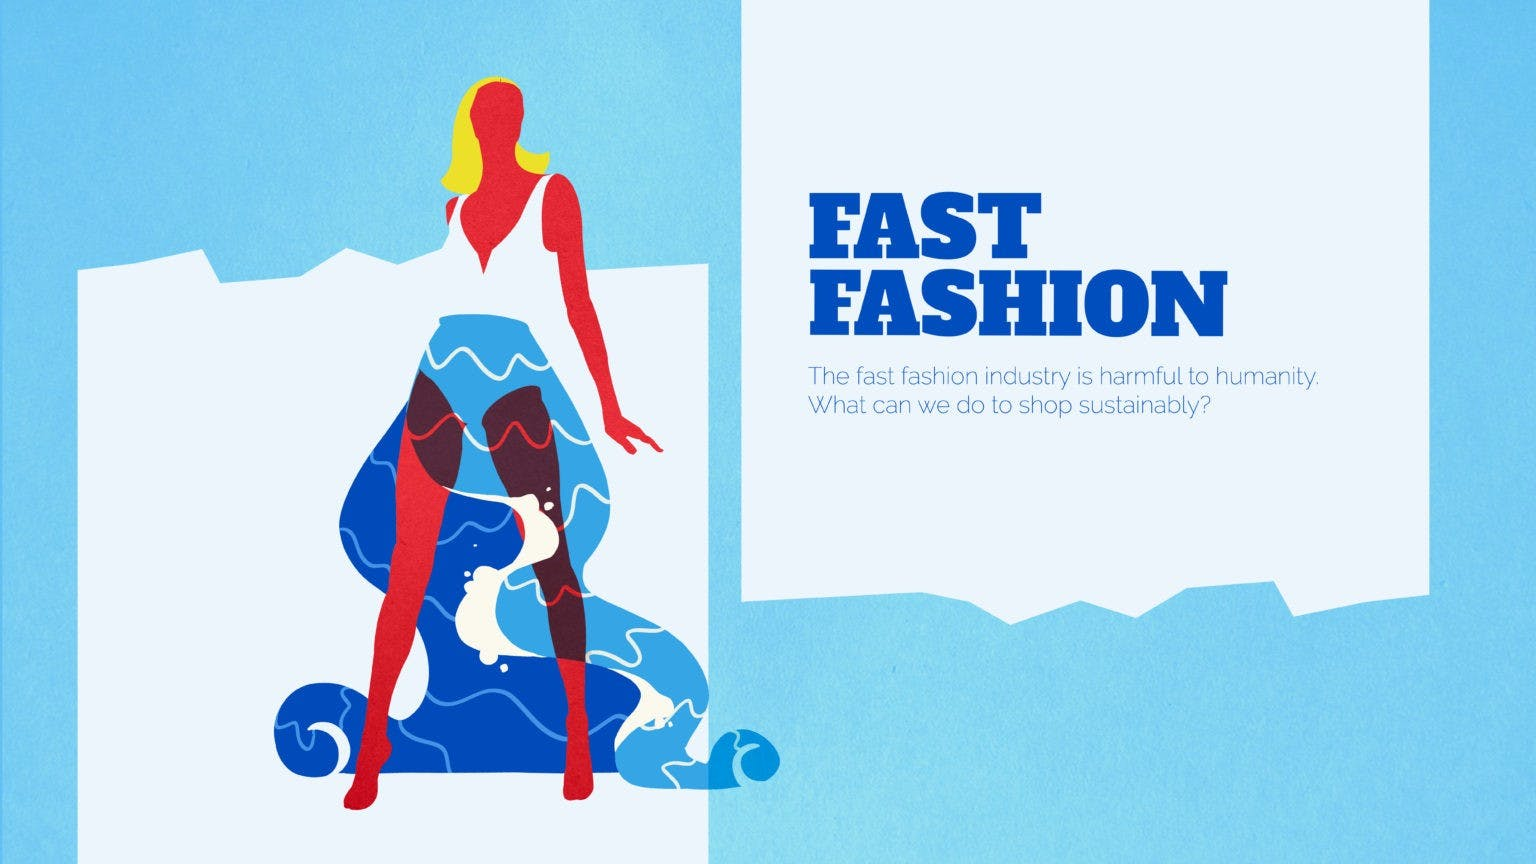 fast_fashion_graphic_alternate_version_fixed_subhead-1536x864.jpg